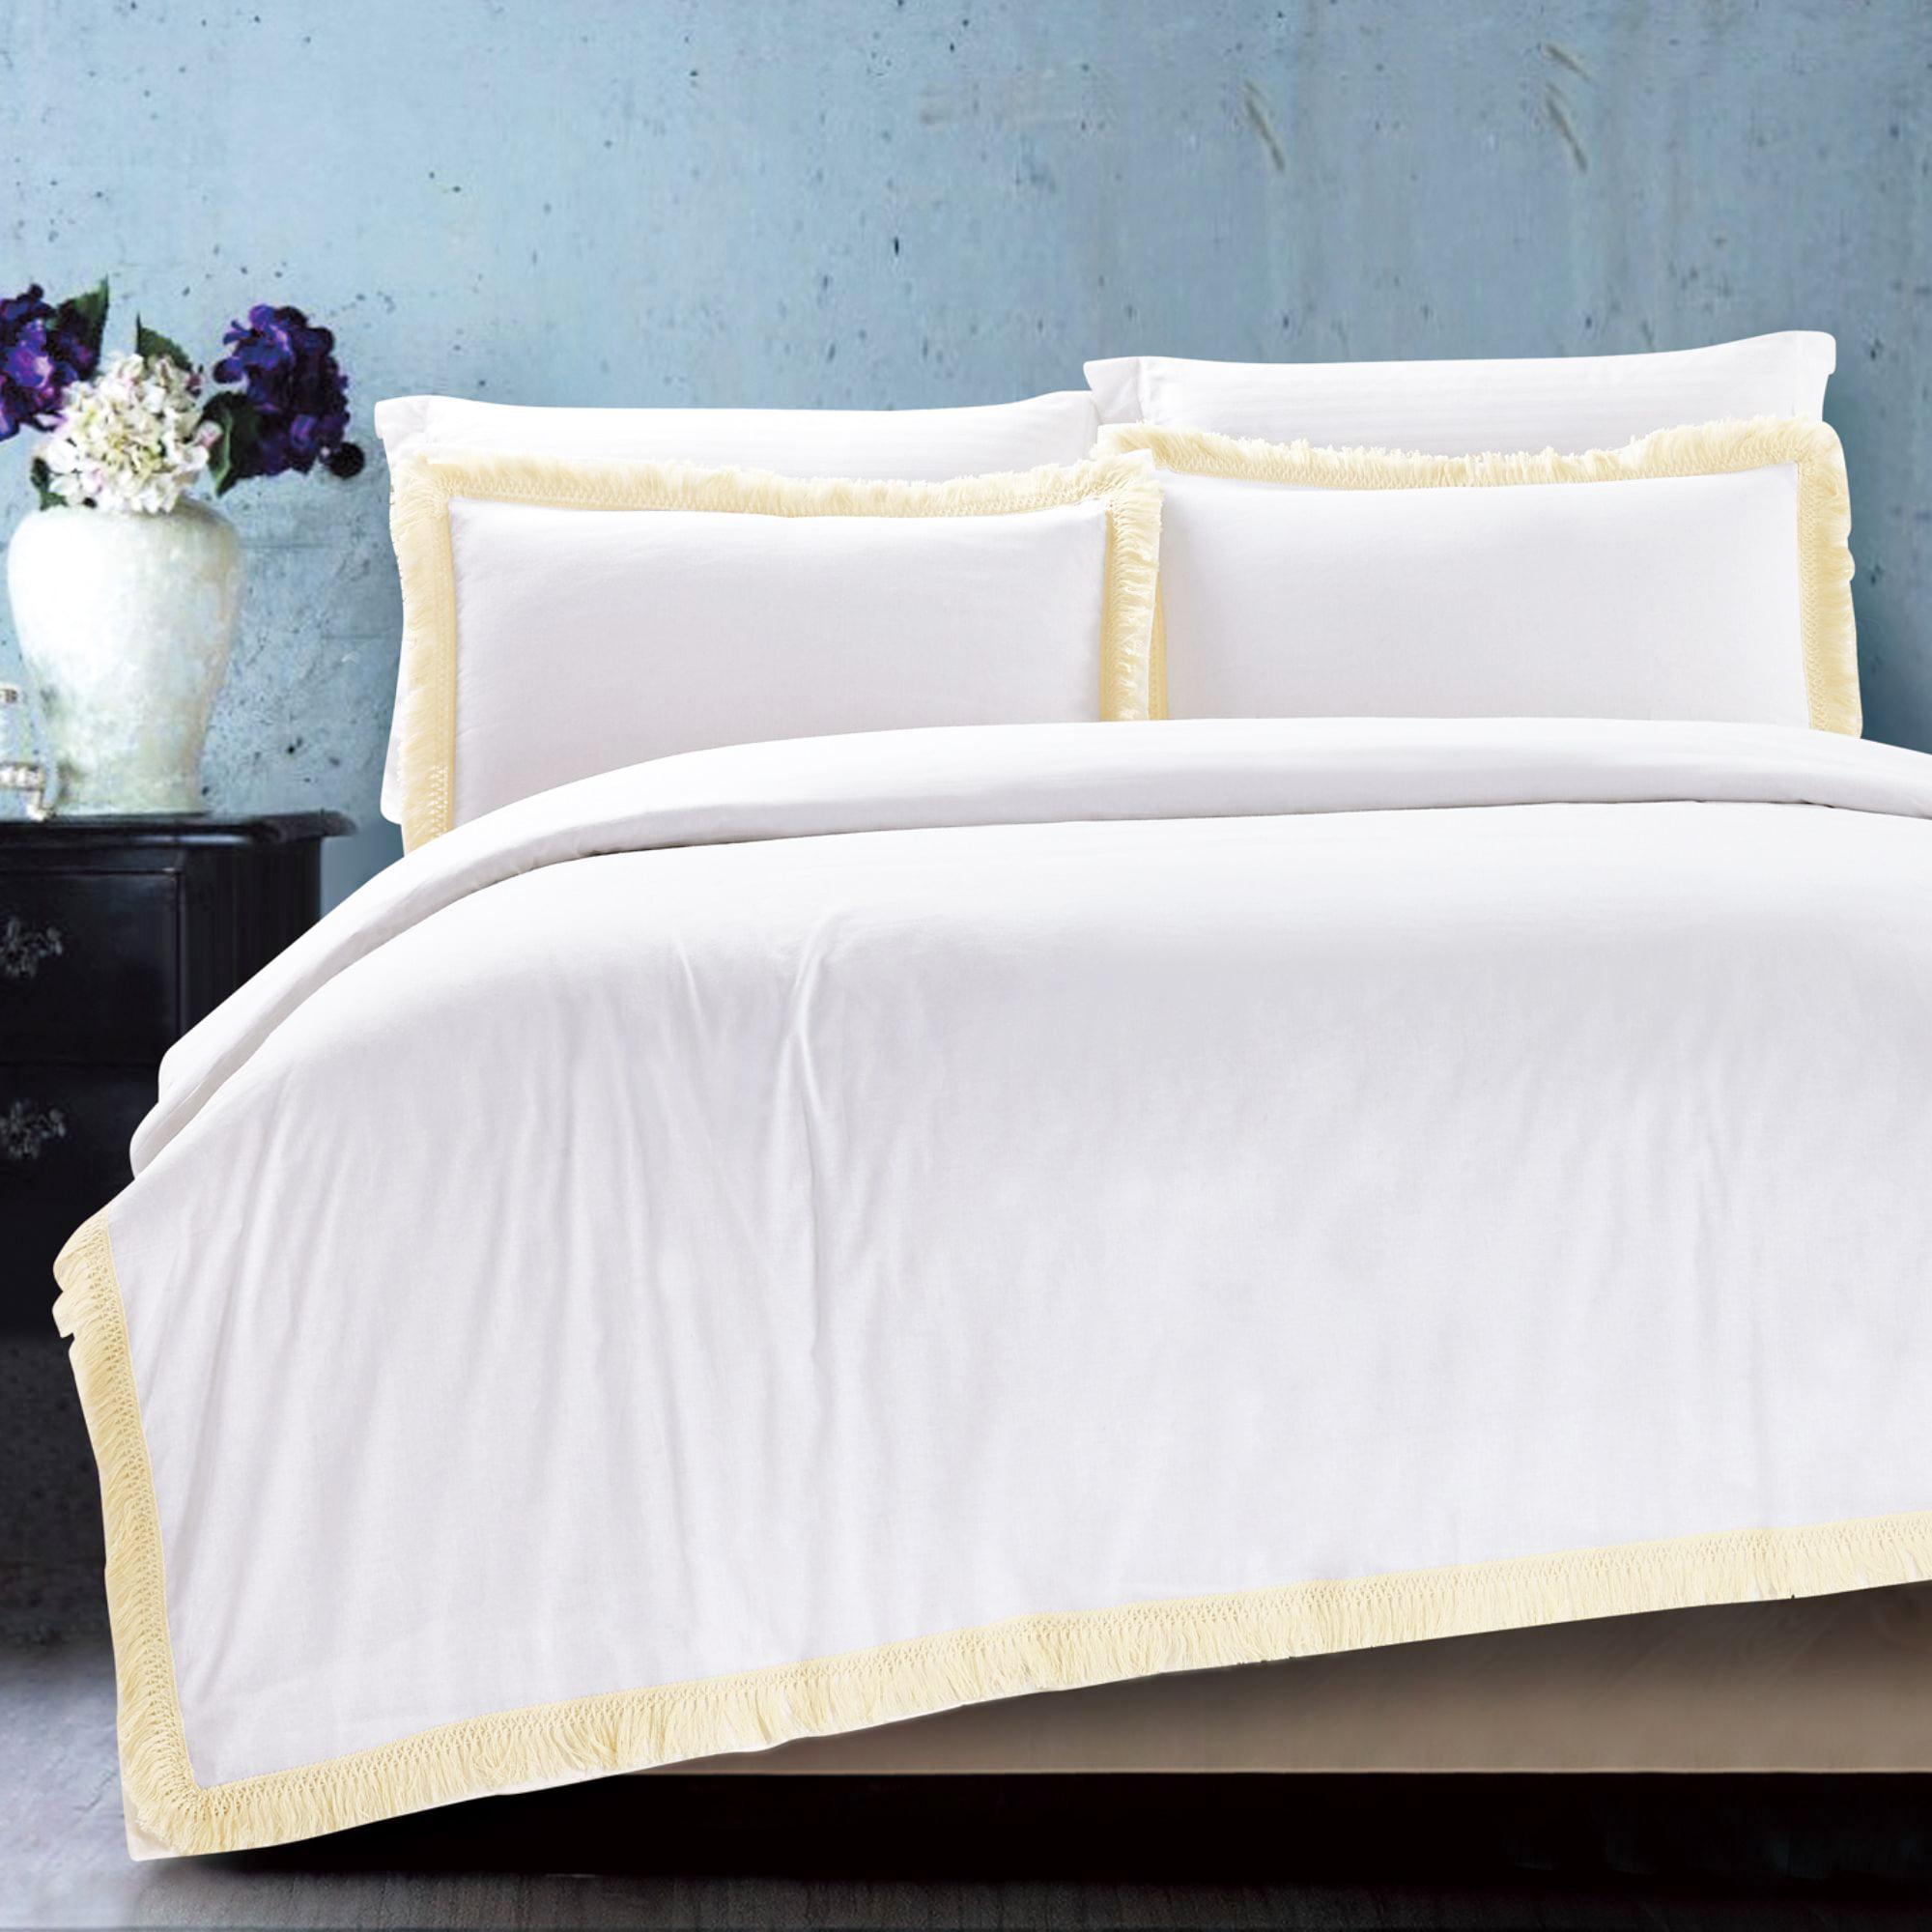 California Design Den Fringes Duvet Cover Set Cotton White, King 3-Piece